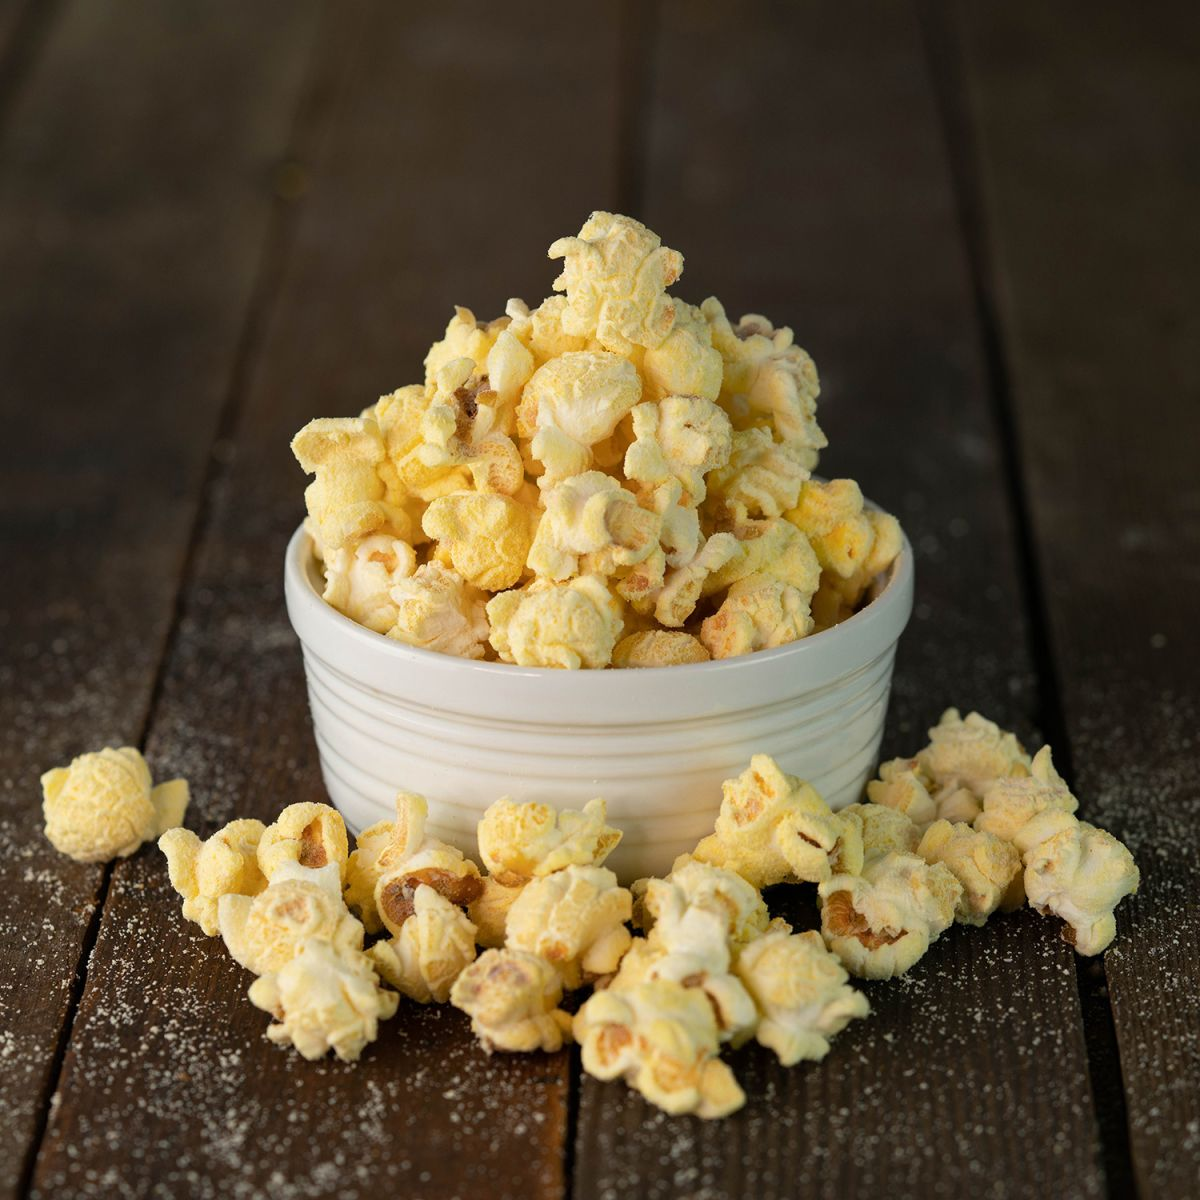 Pease's White Cheddar Popcorn